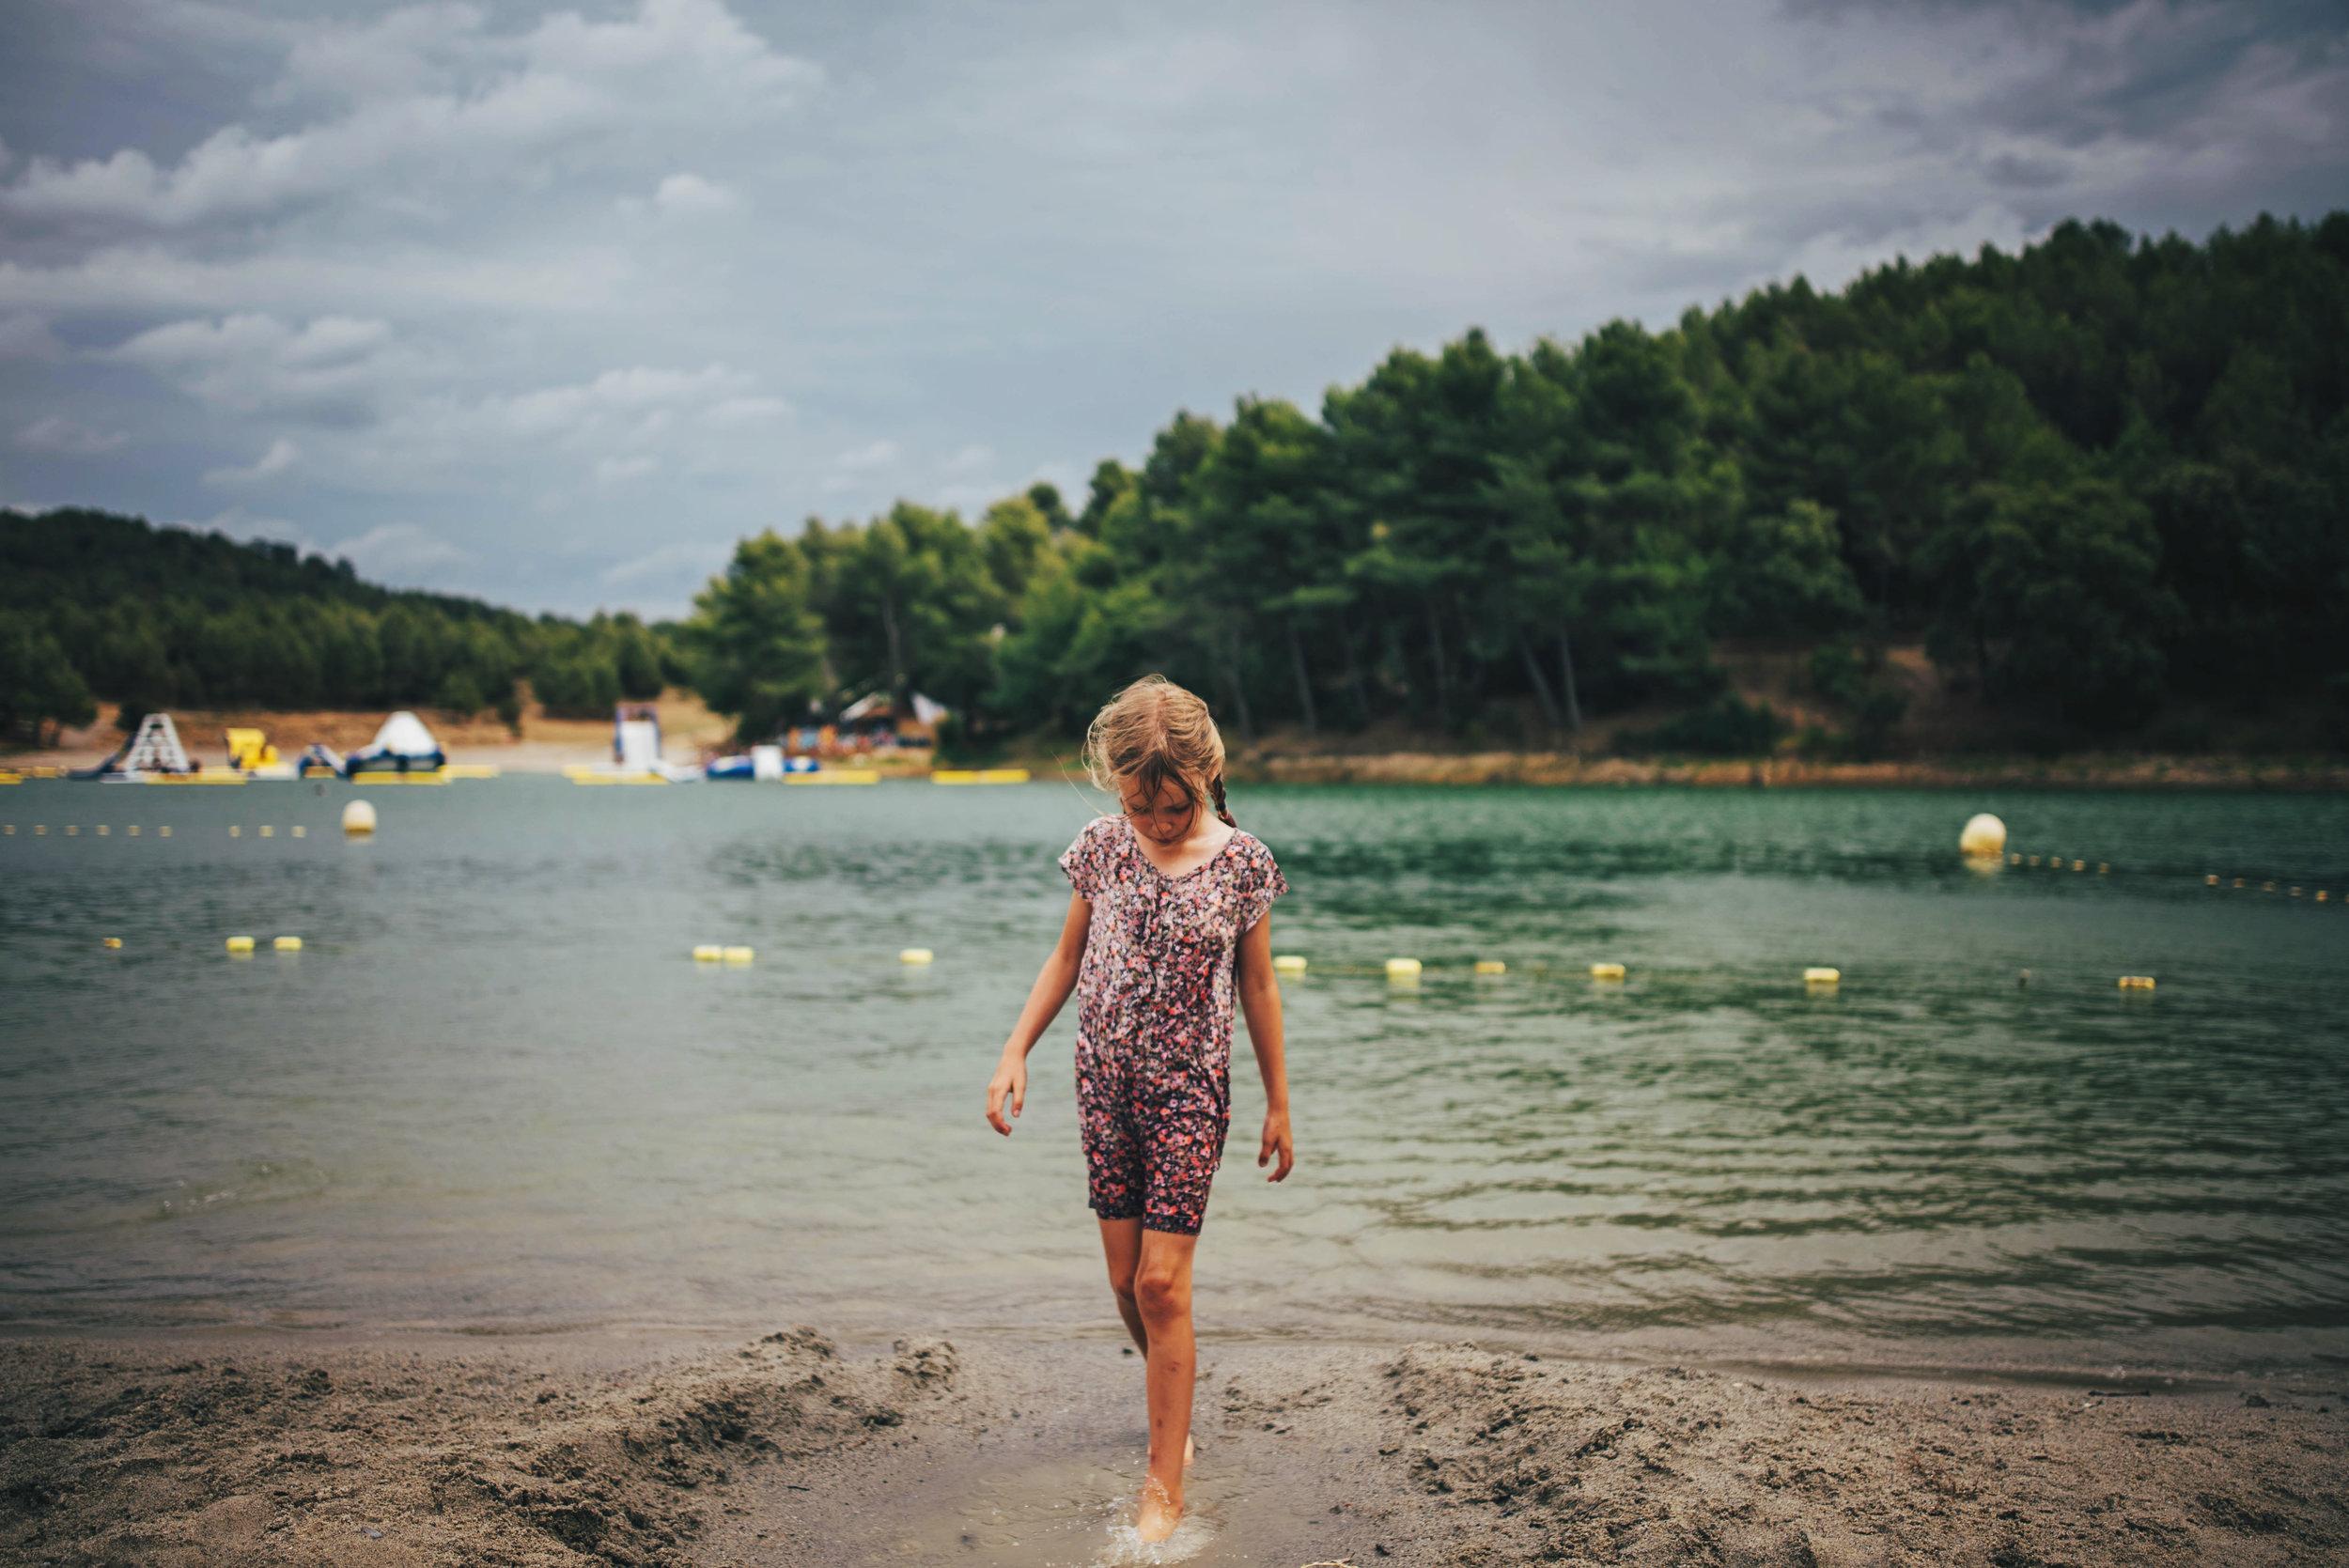 Young girl walks into Lake Essex UK Documentary Portrait Photographer